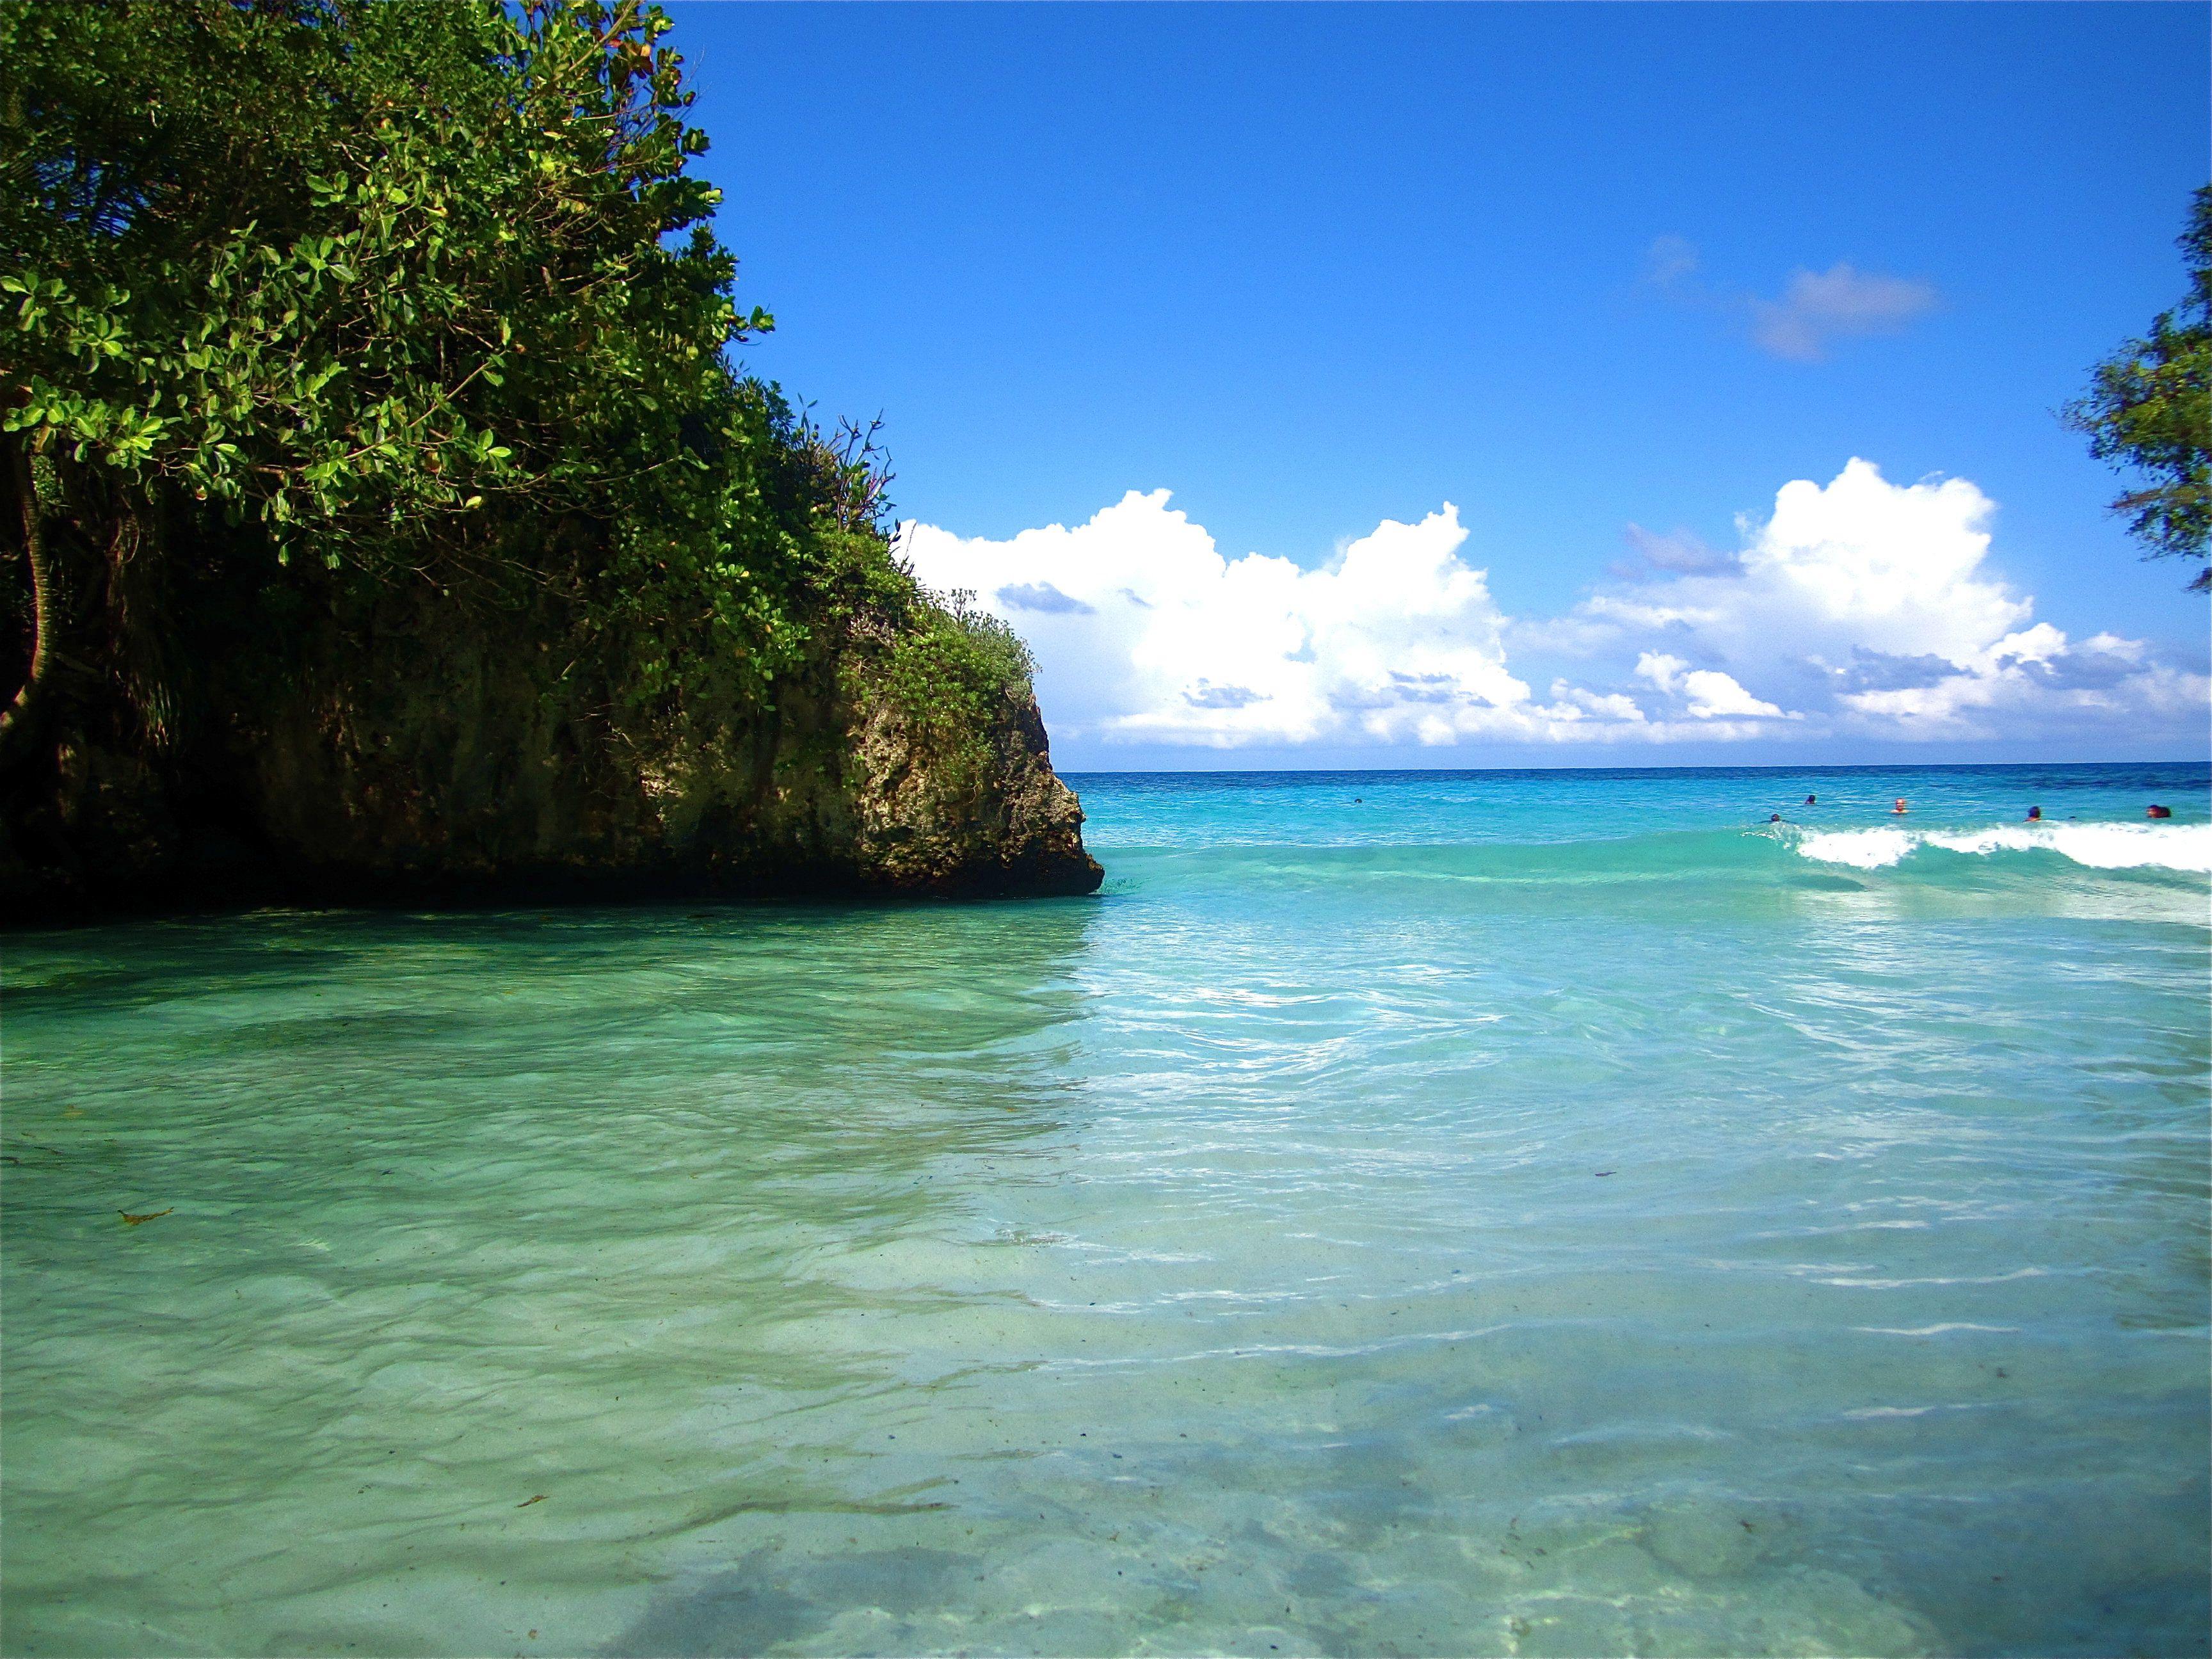 San Beach Jamaica Yahoo Image Search Results